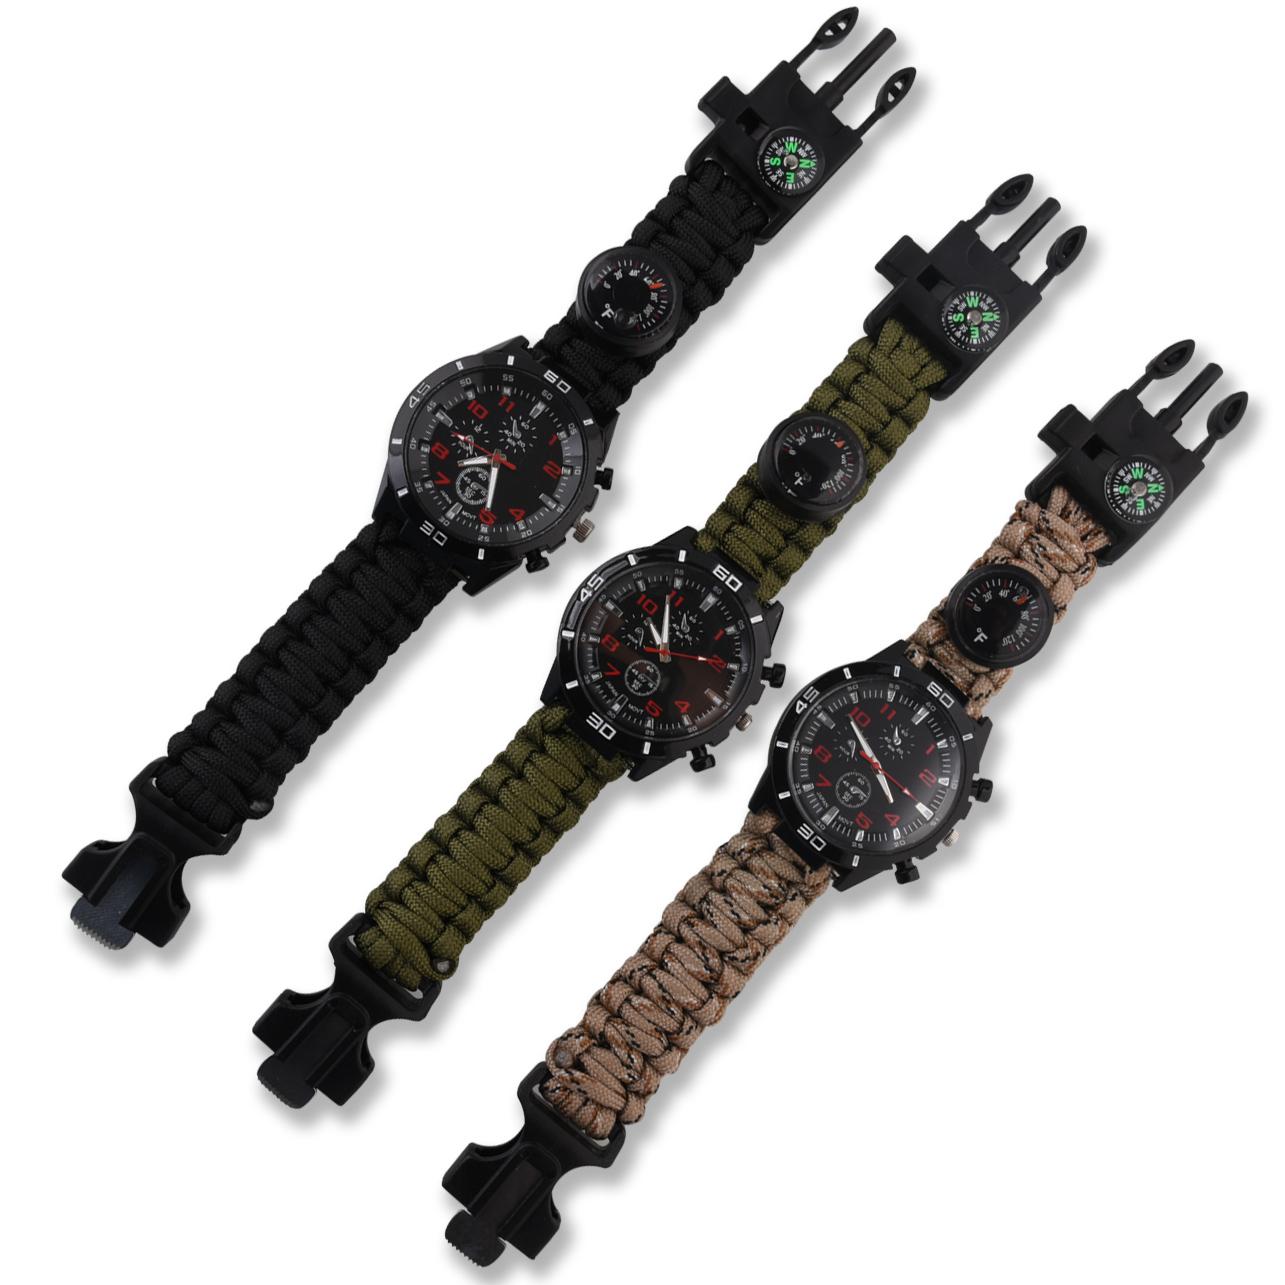 Заказать наручные часы с компасом